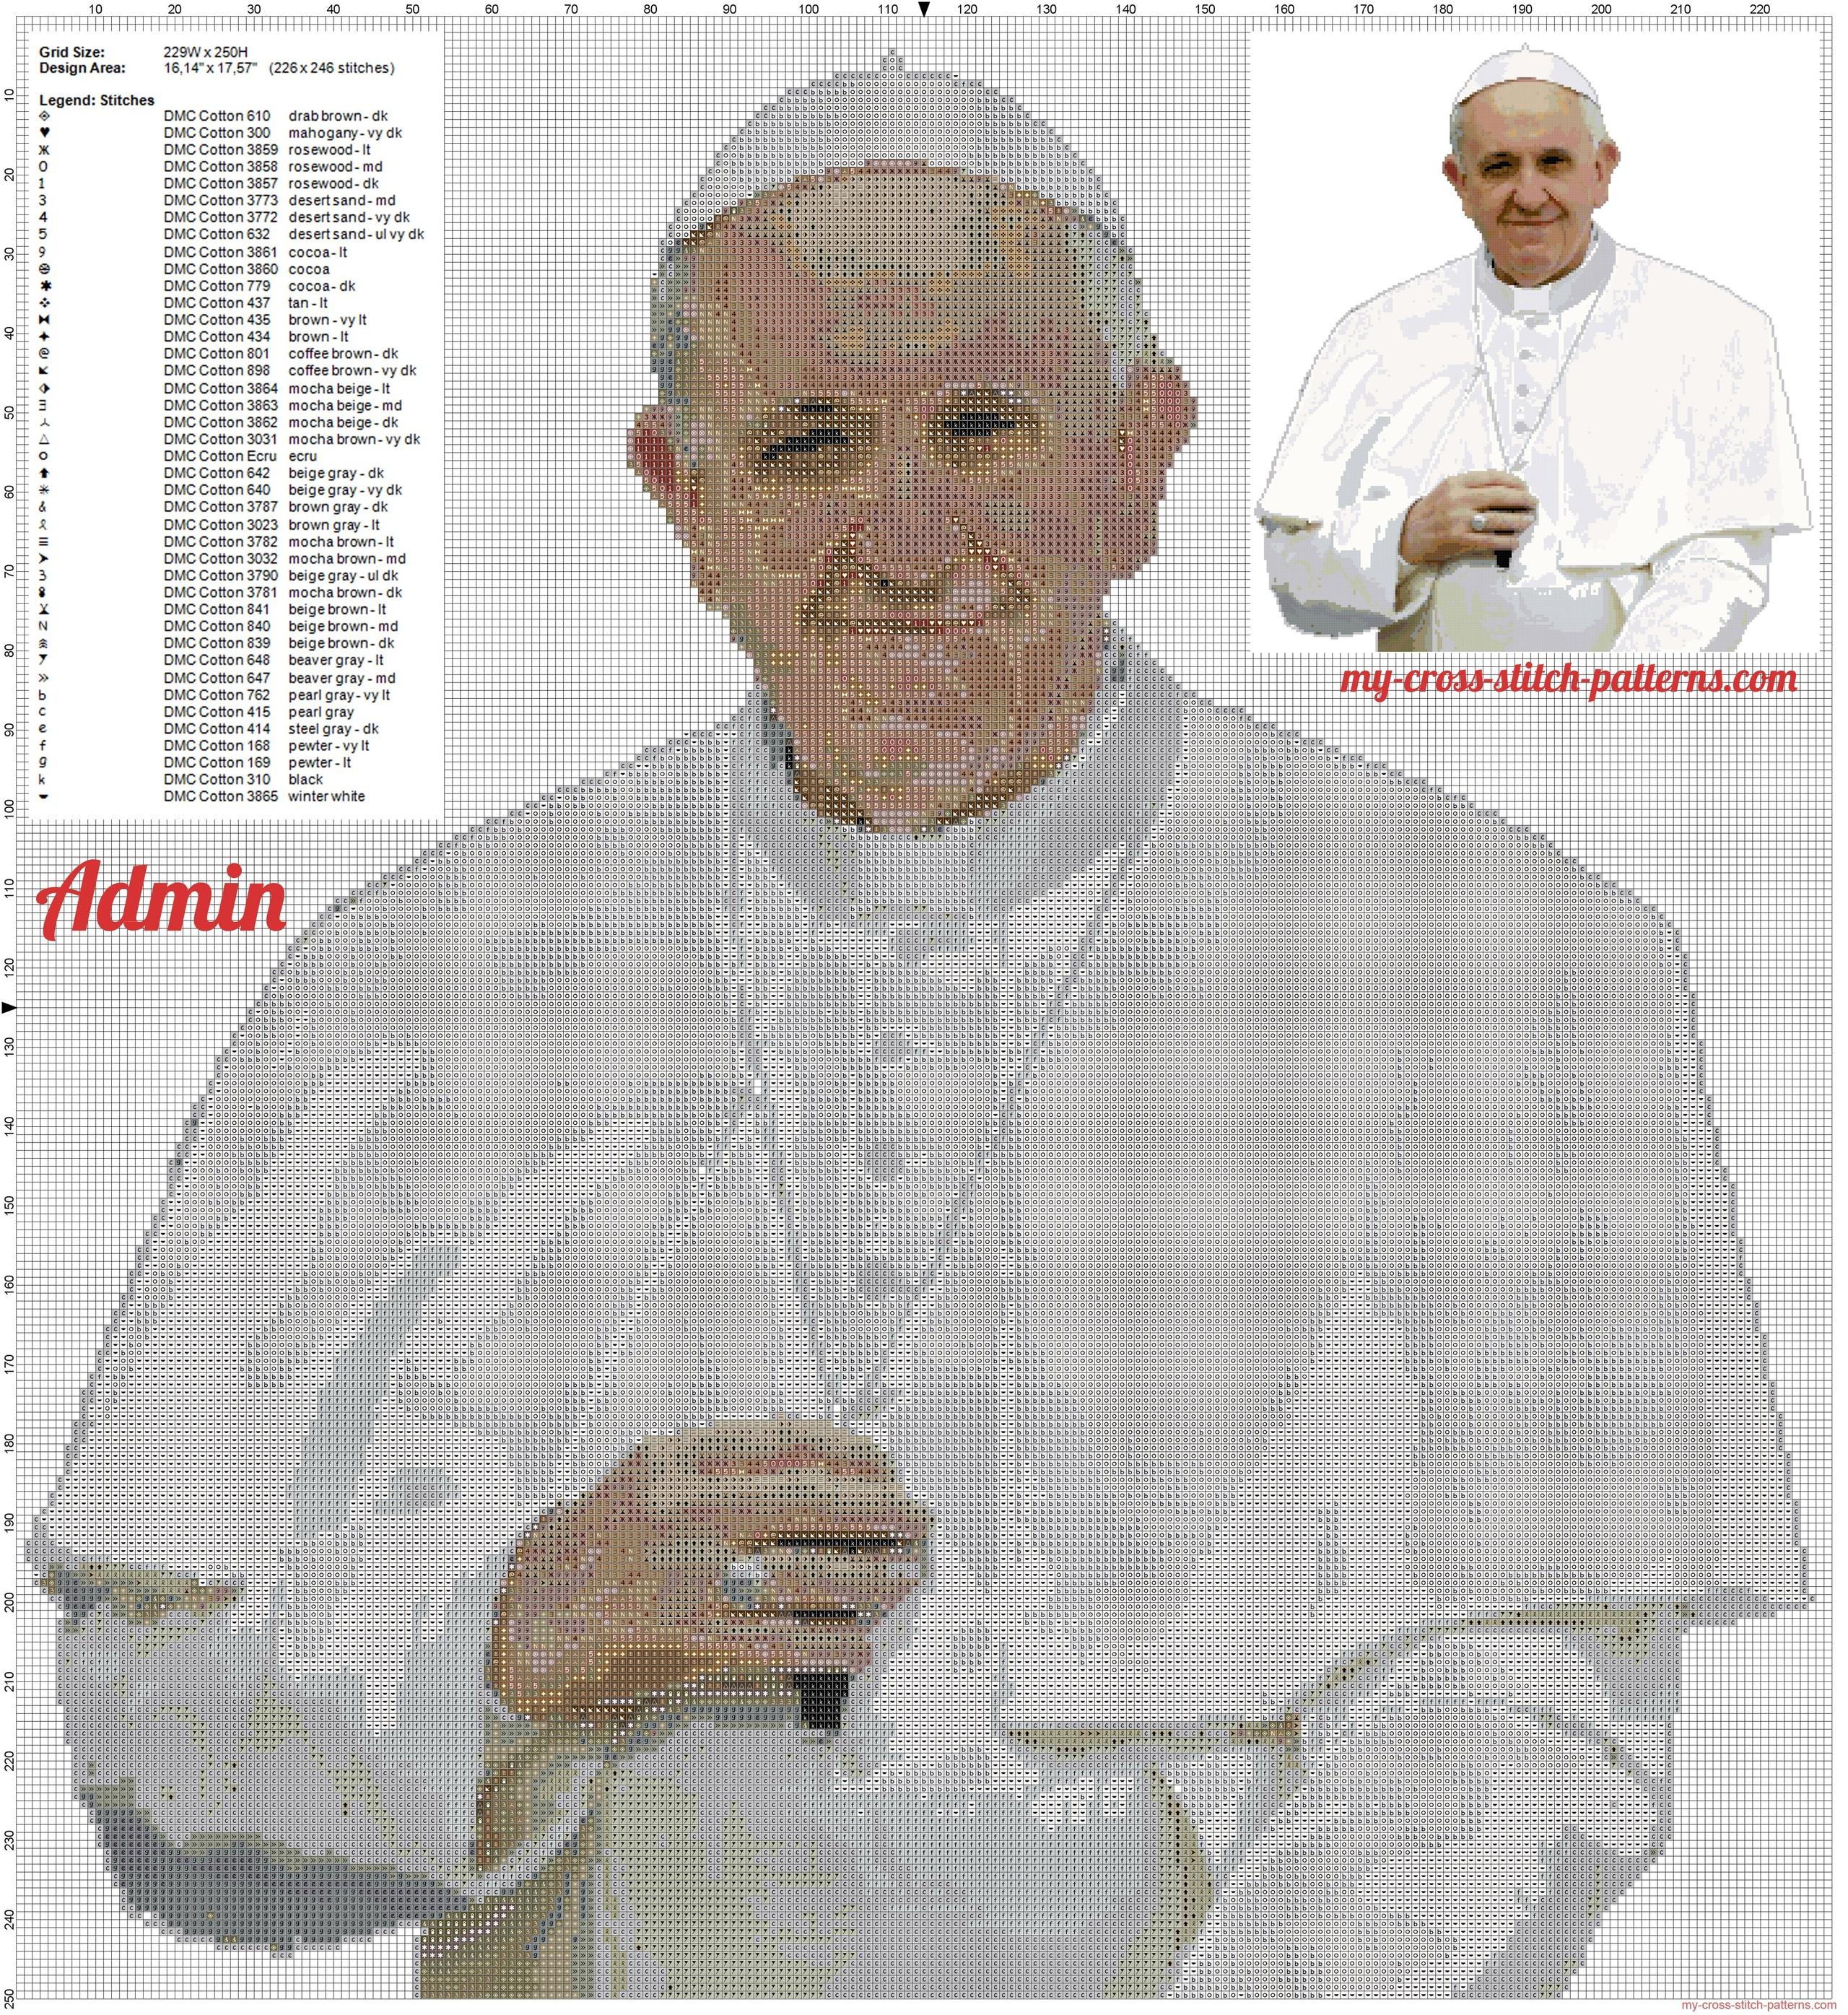 pope_francis_a_new_cross_stitch_pattern_free